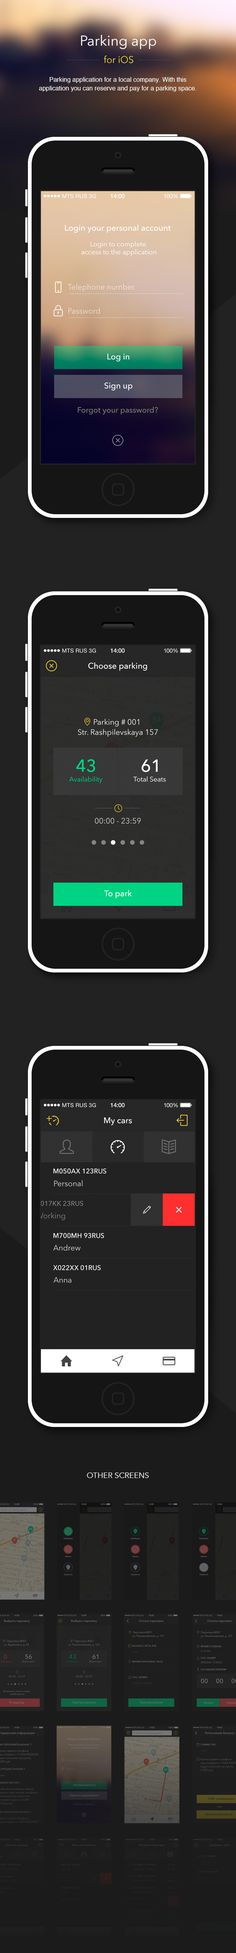 Parking app iOS on Behance